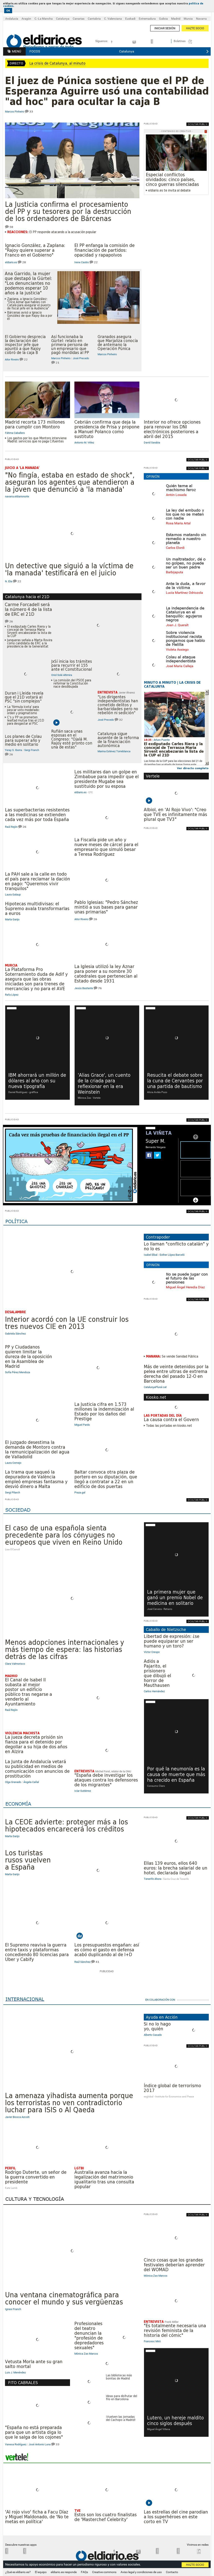 El Diario at Wednesday Nov. 15, 2017, 6:02 p.m. UTC